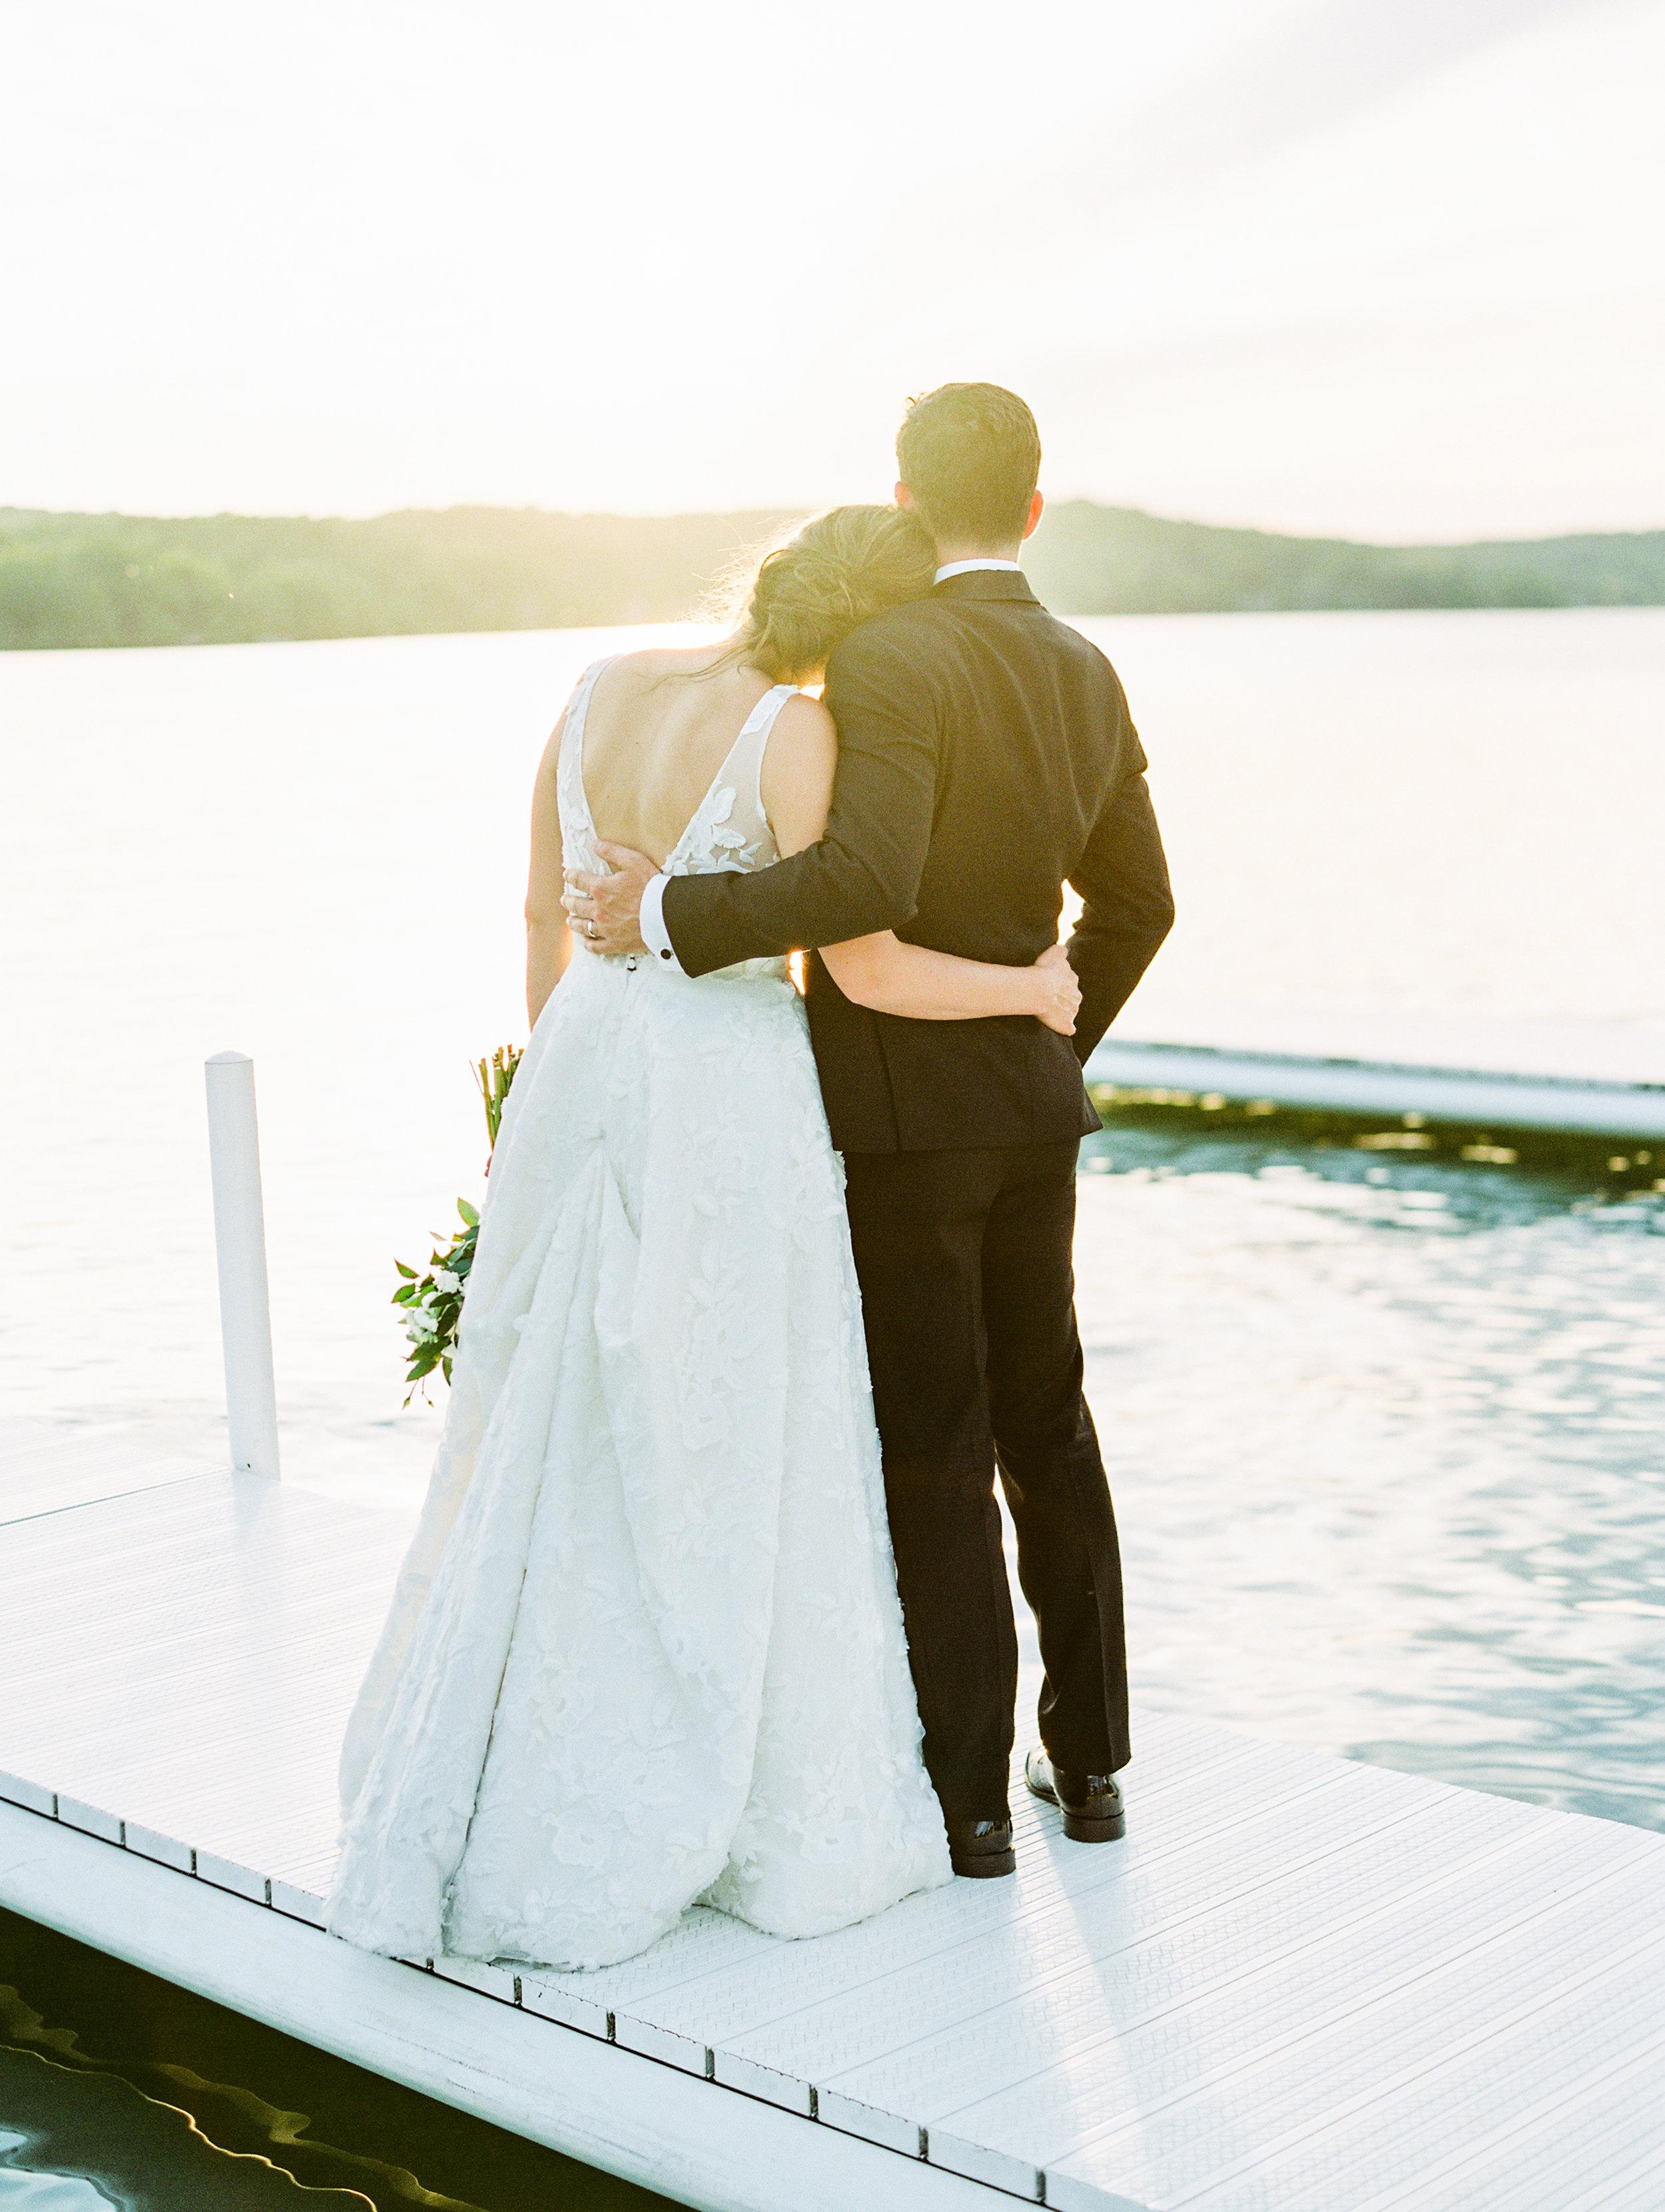 DeGuilio+Wedding+BrideGroomSunsetf-8.jpg